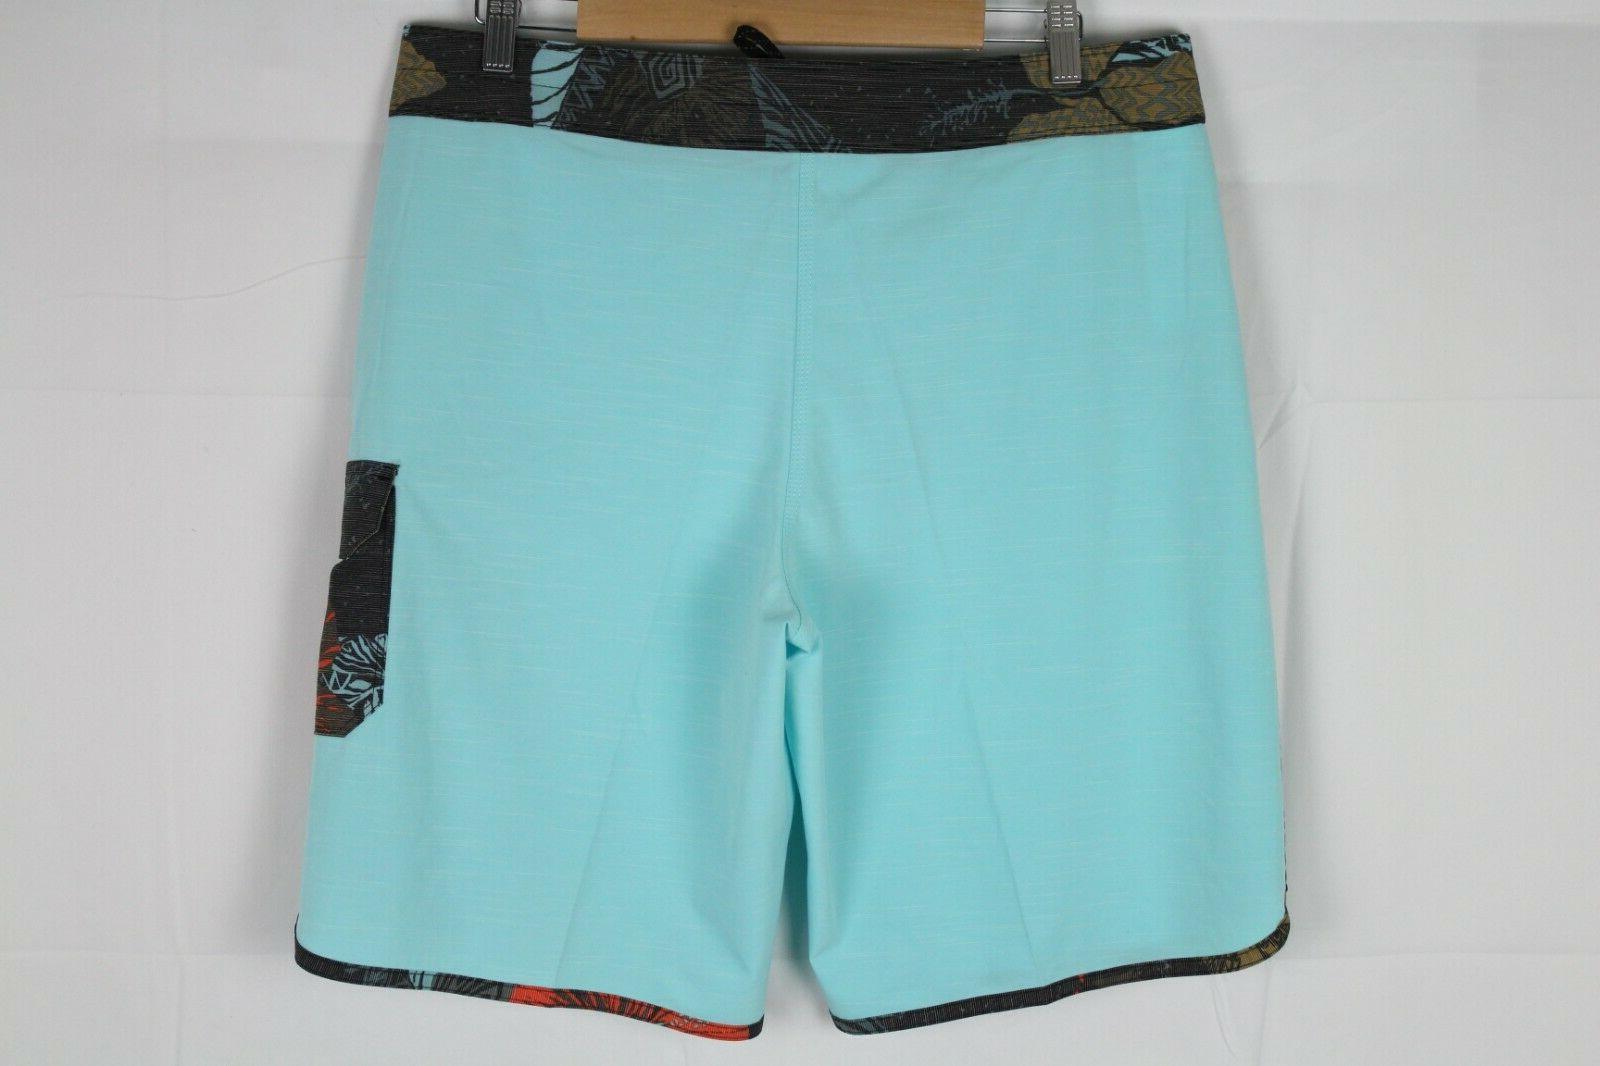 New Men's X Shorts Mint